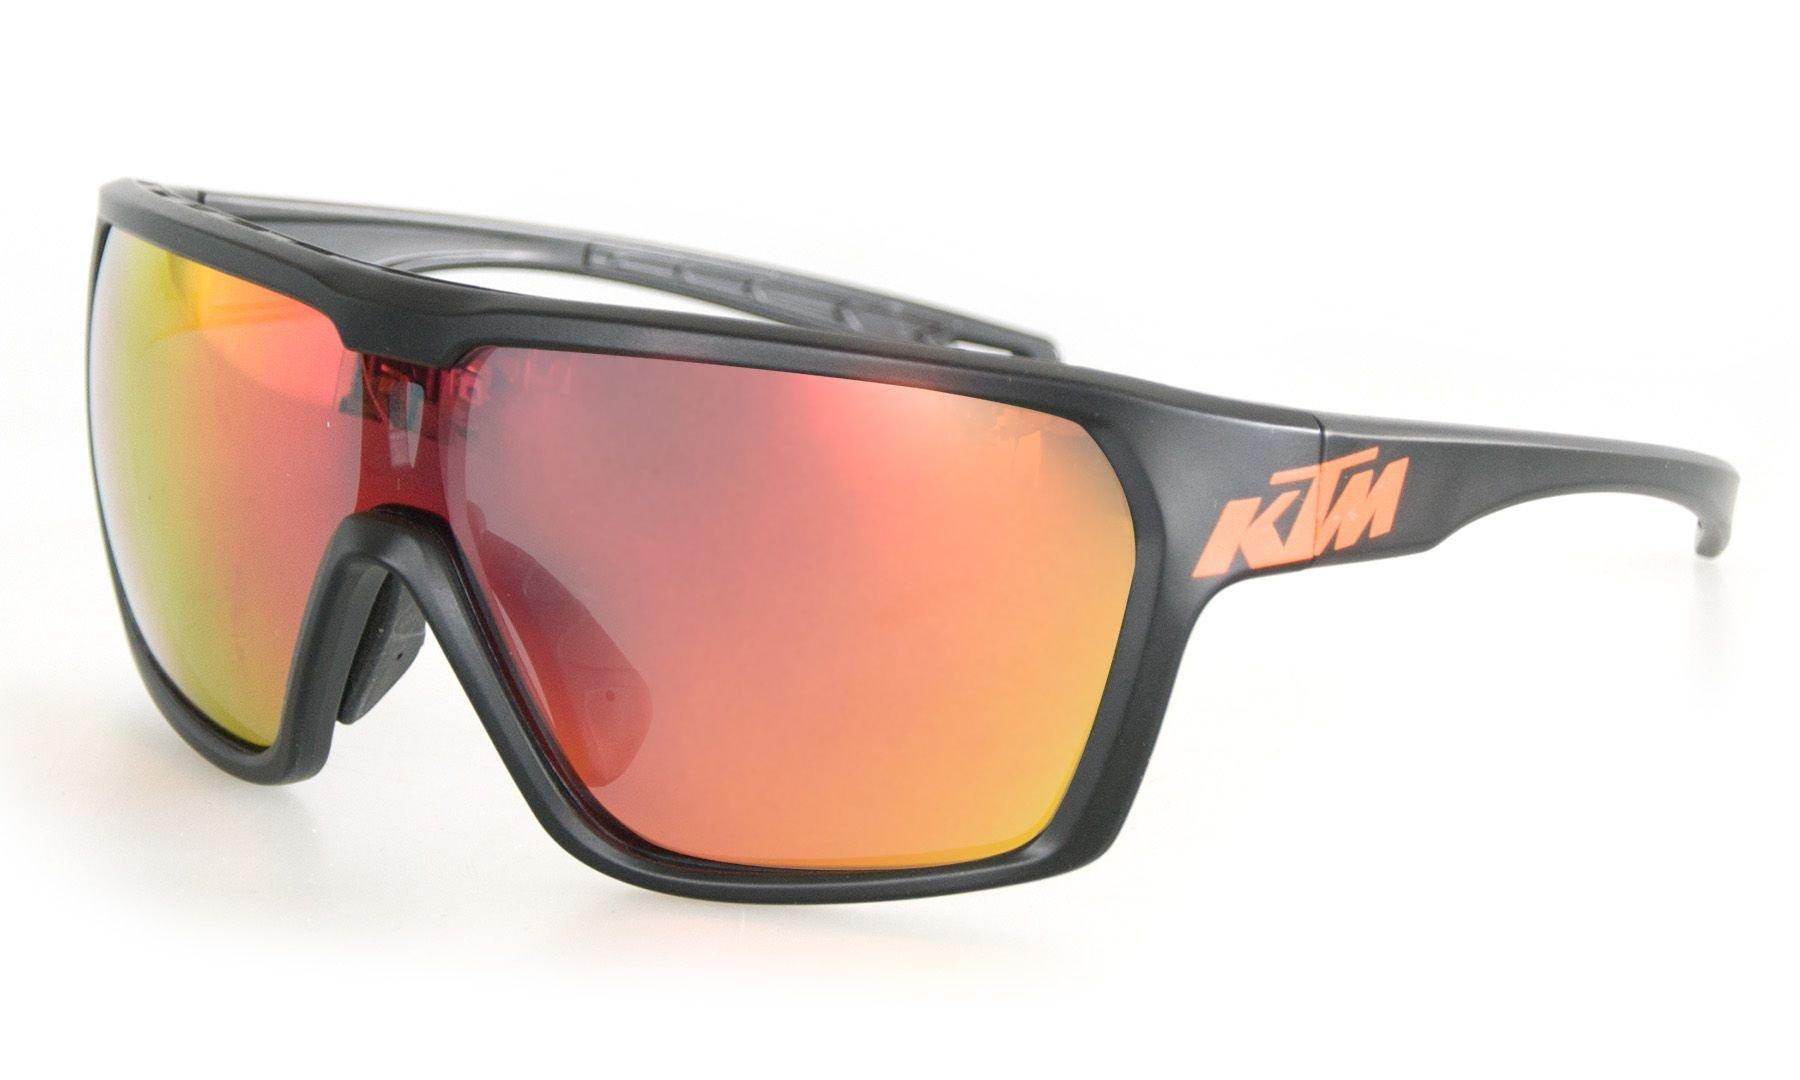 KTM Sonnenbrille Unisex Factory Character Polarized C3